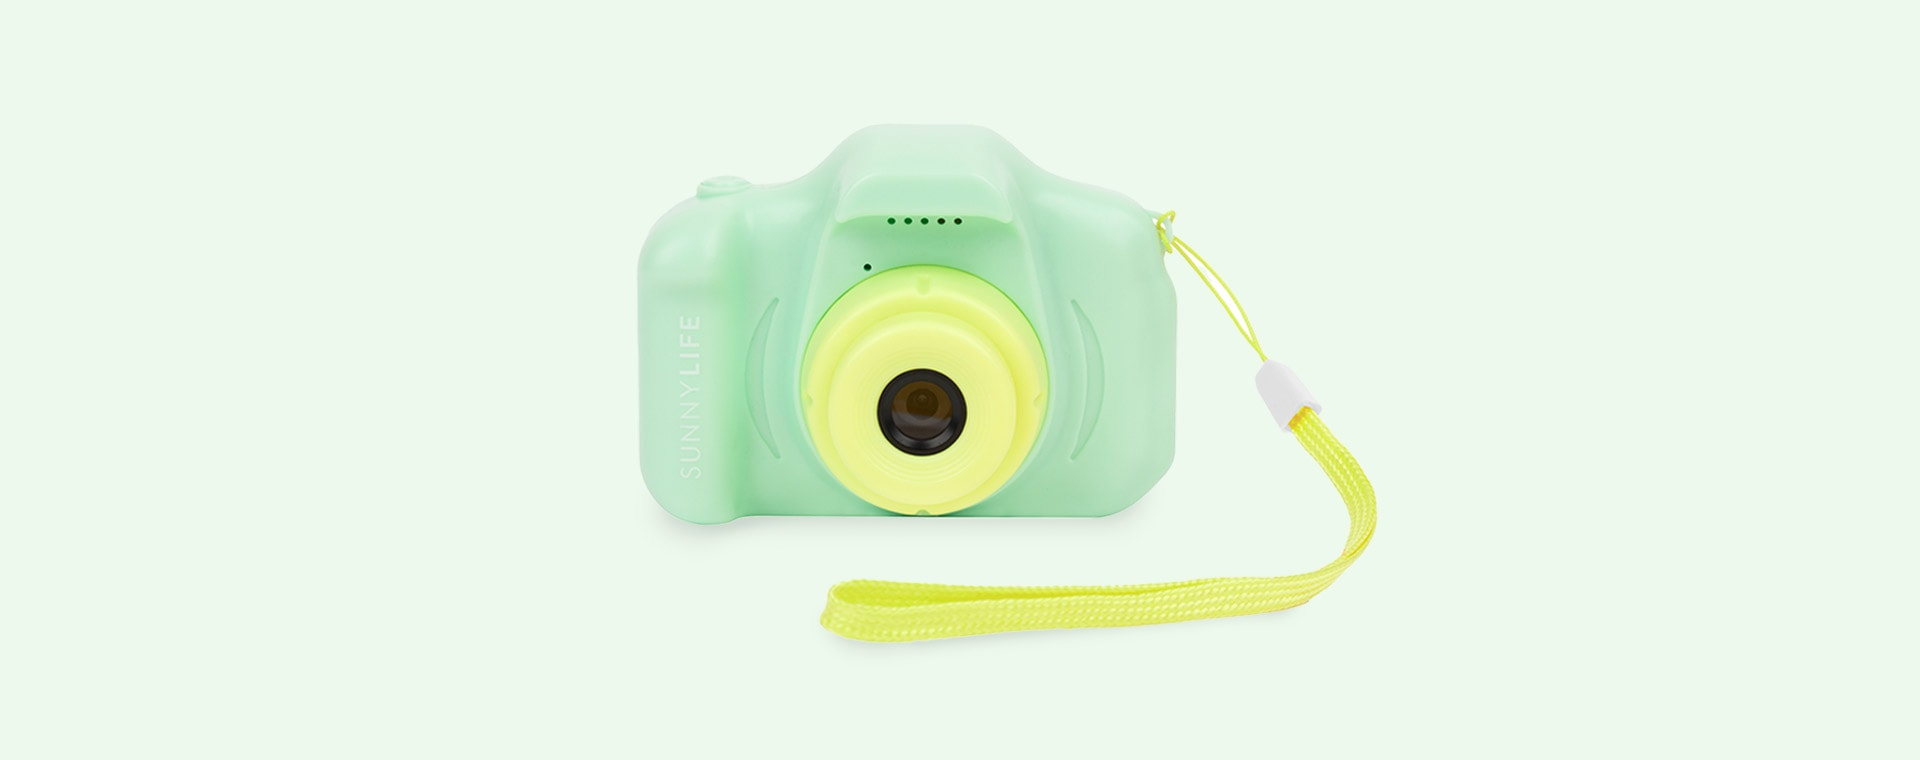 Green Sunnylife Snap Me Digi Camera